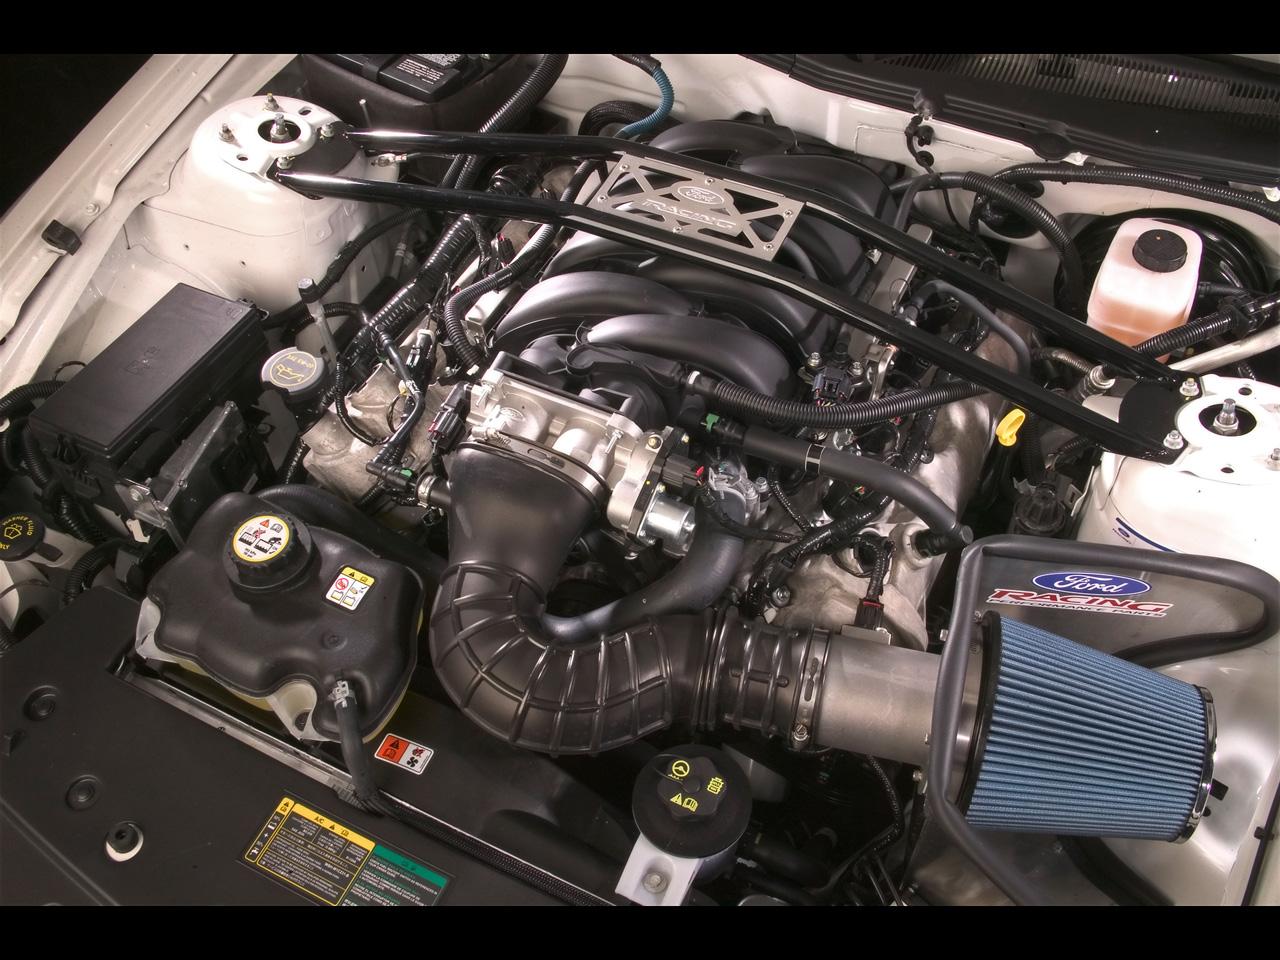 2007 Shelby Mustang Gt Conceptcarz Com